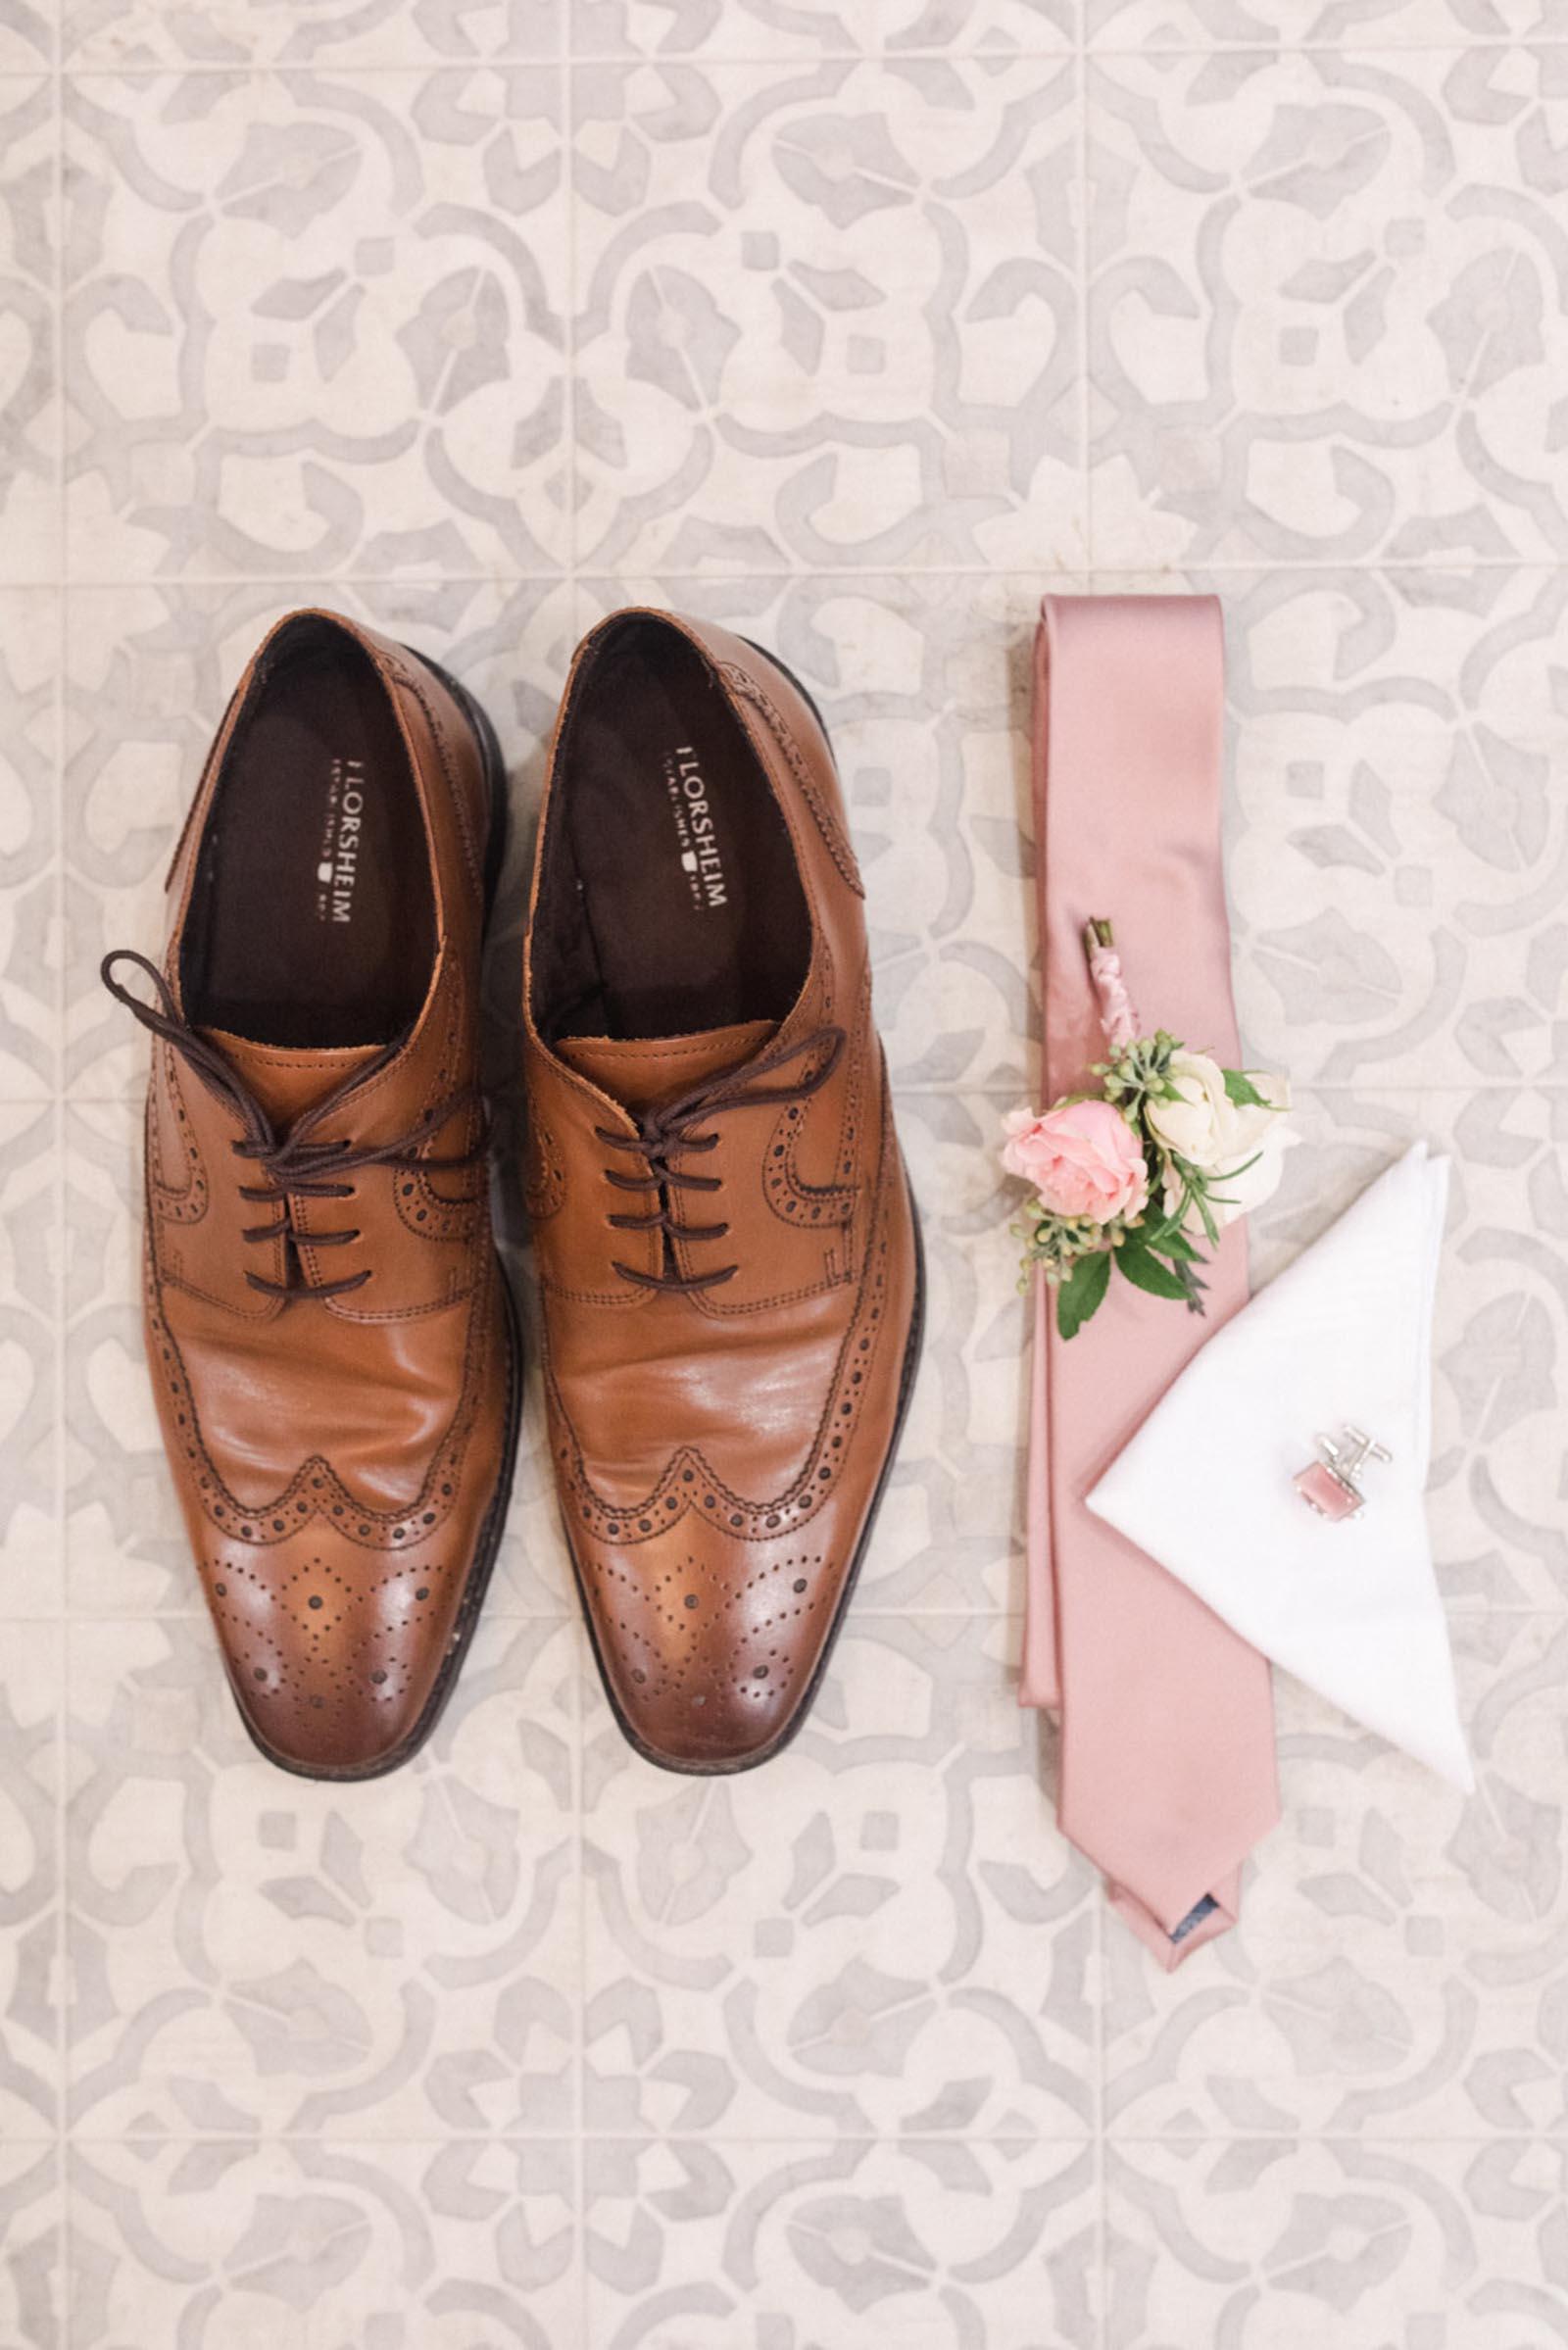 The RoseMary Barn Wedding-JenSymes-8.jpg